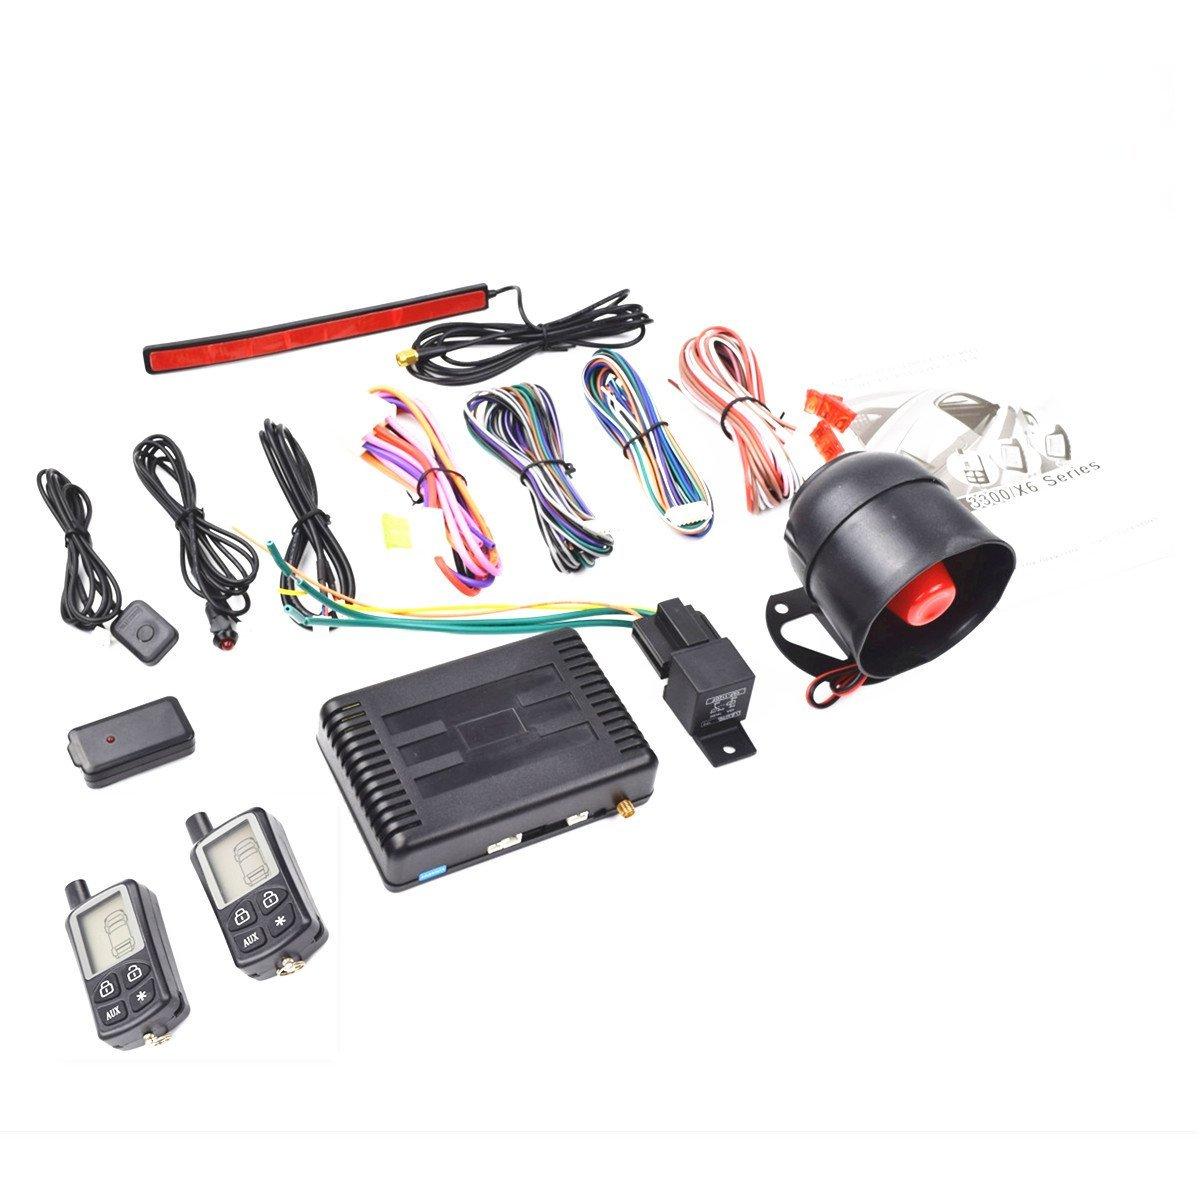 CarBest Vehicle Security Paging Car Alarm 2 Way LCD Sensor Remote Engine Start System Kit Automatic | Passive Keyless Entry(PKE) | Car Burglar Alarm System - CA-3300A